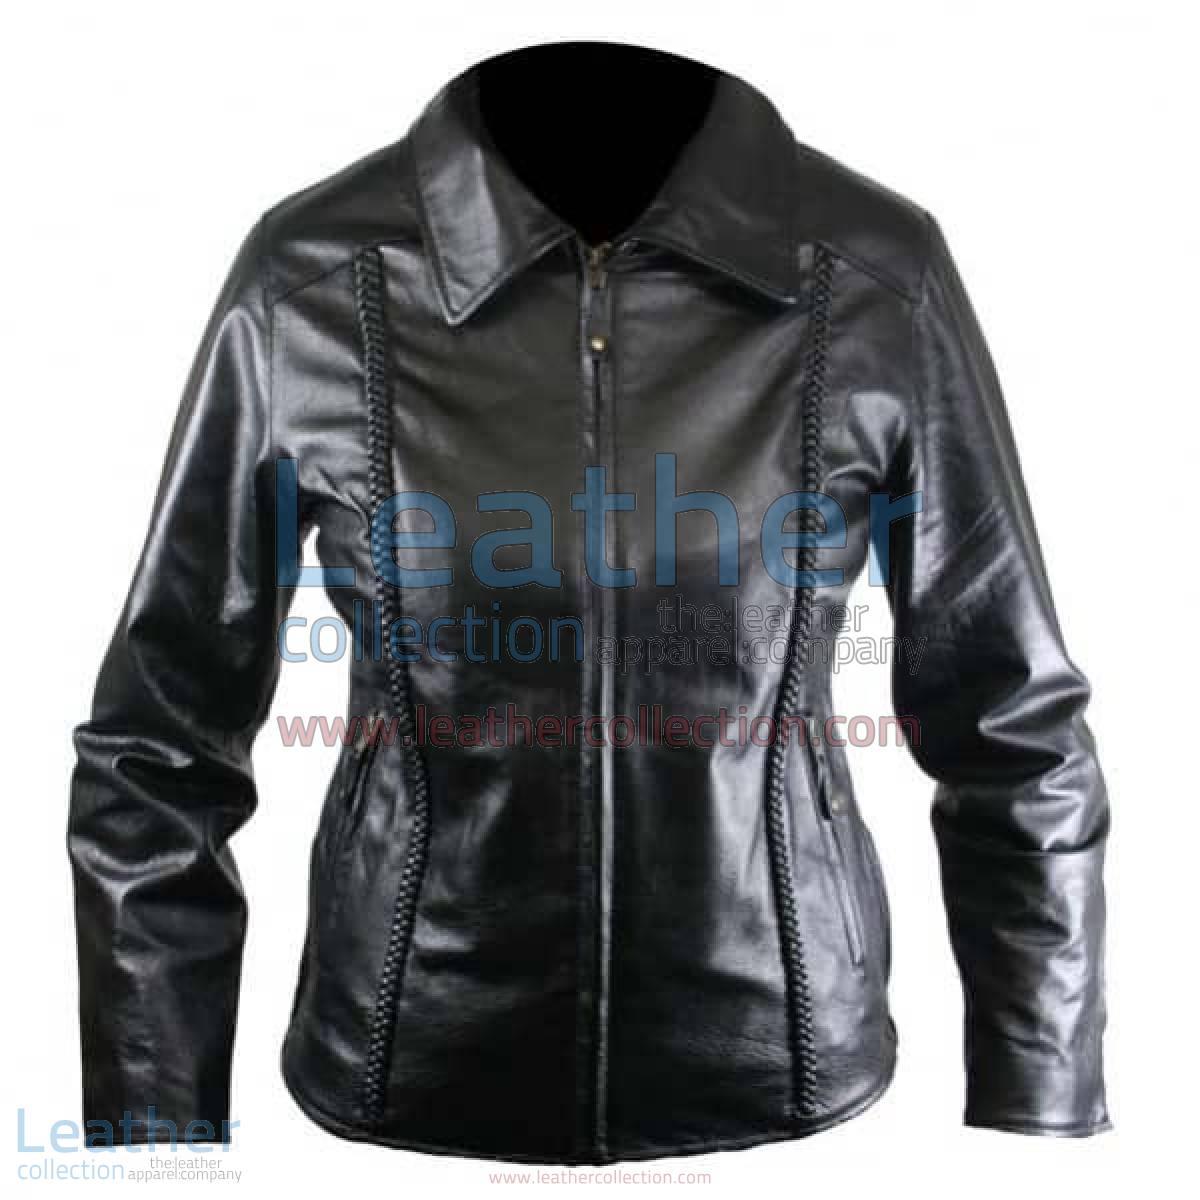 Ladies Front Braided Leather Jacket | braided leatherjacket